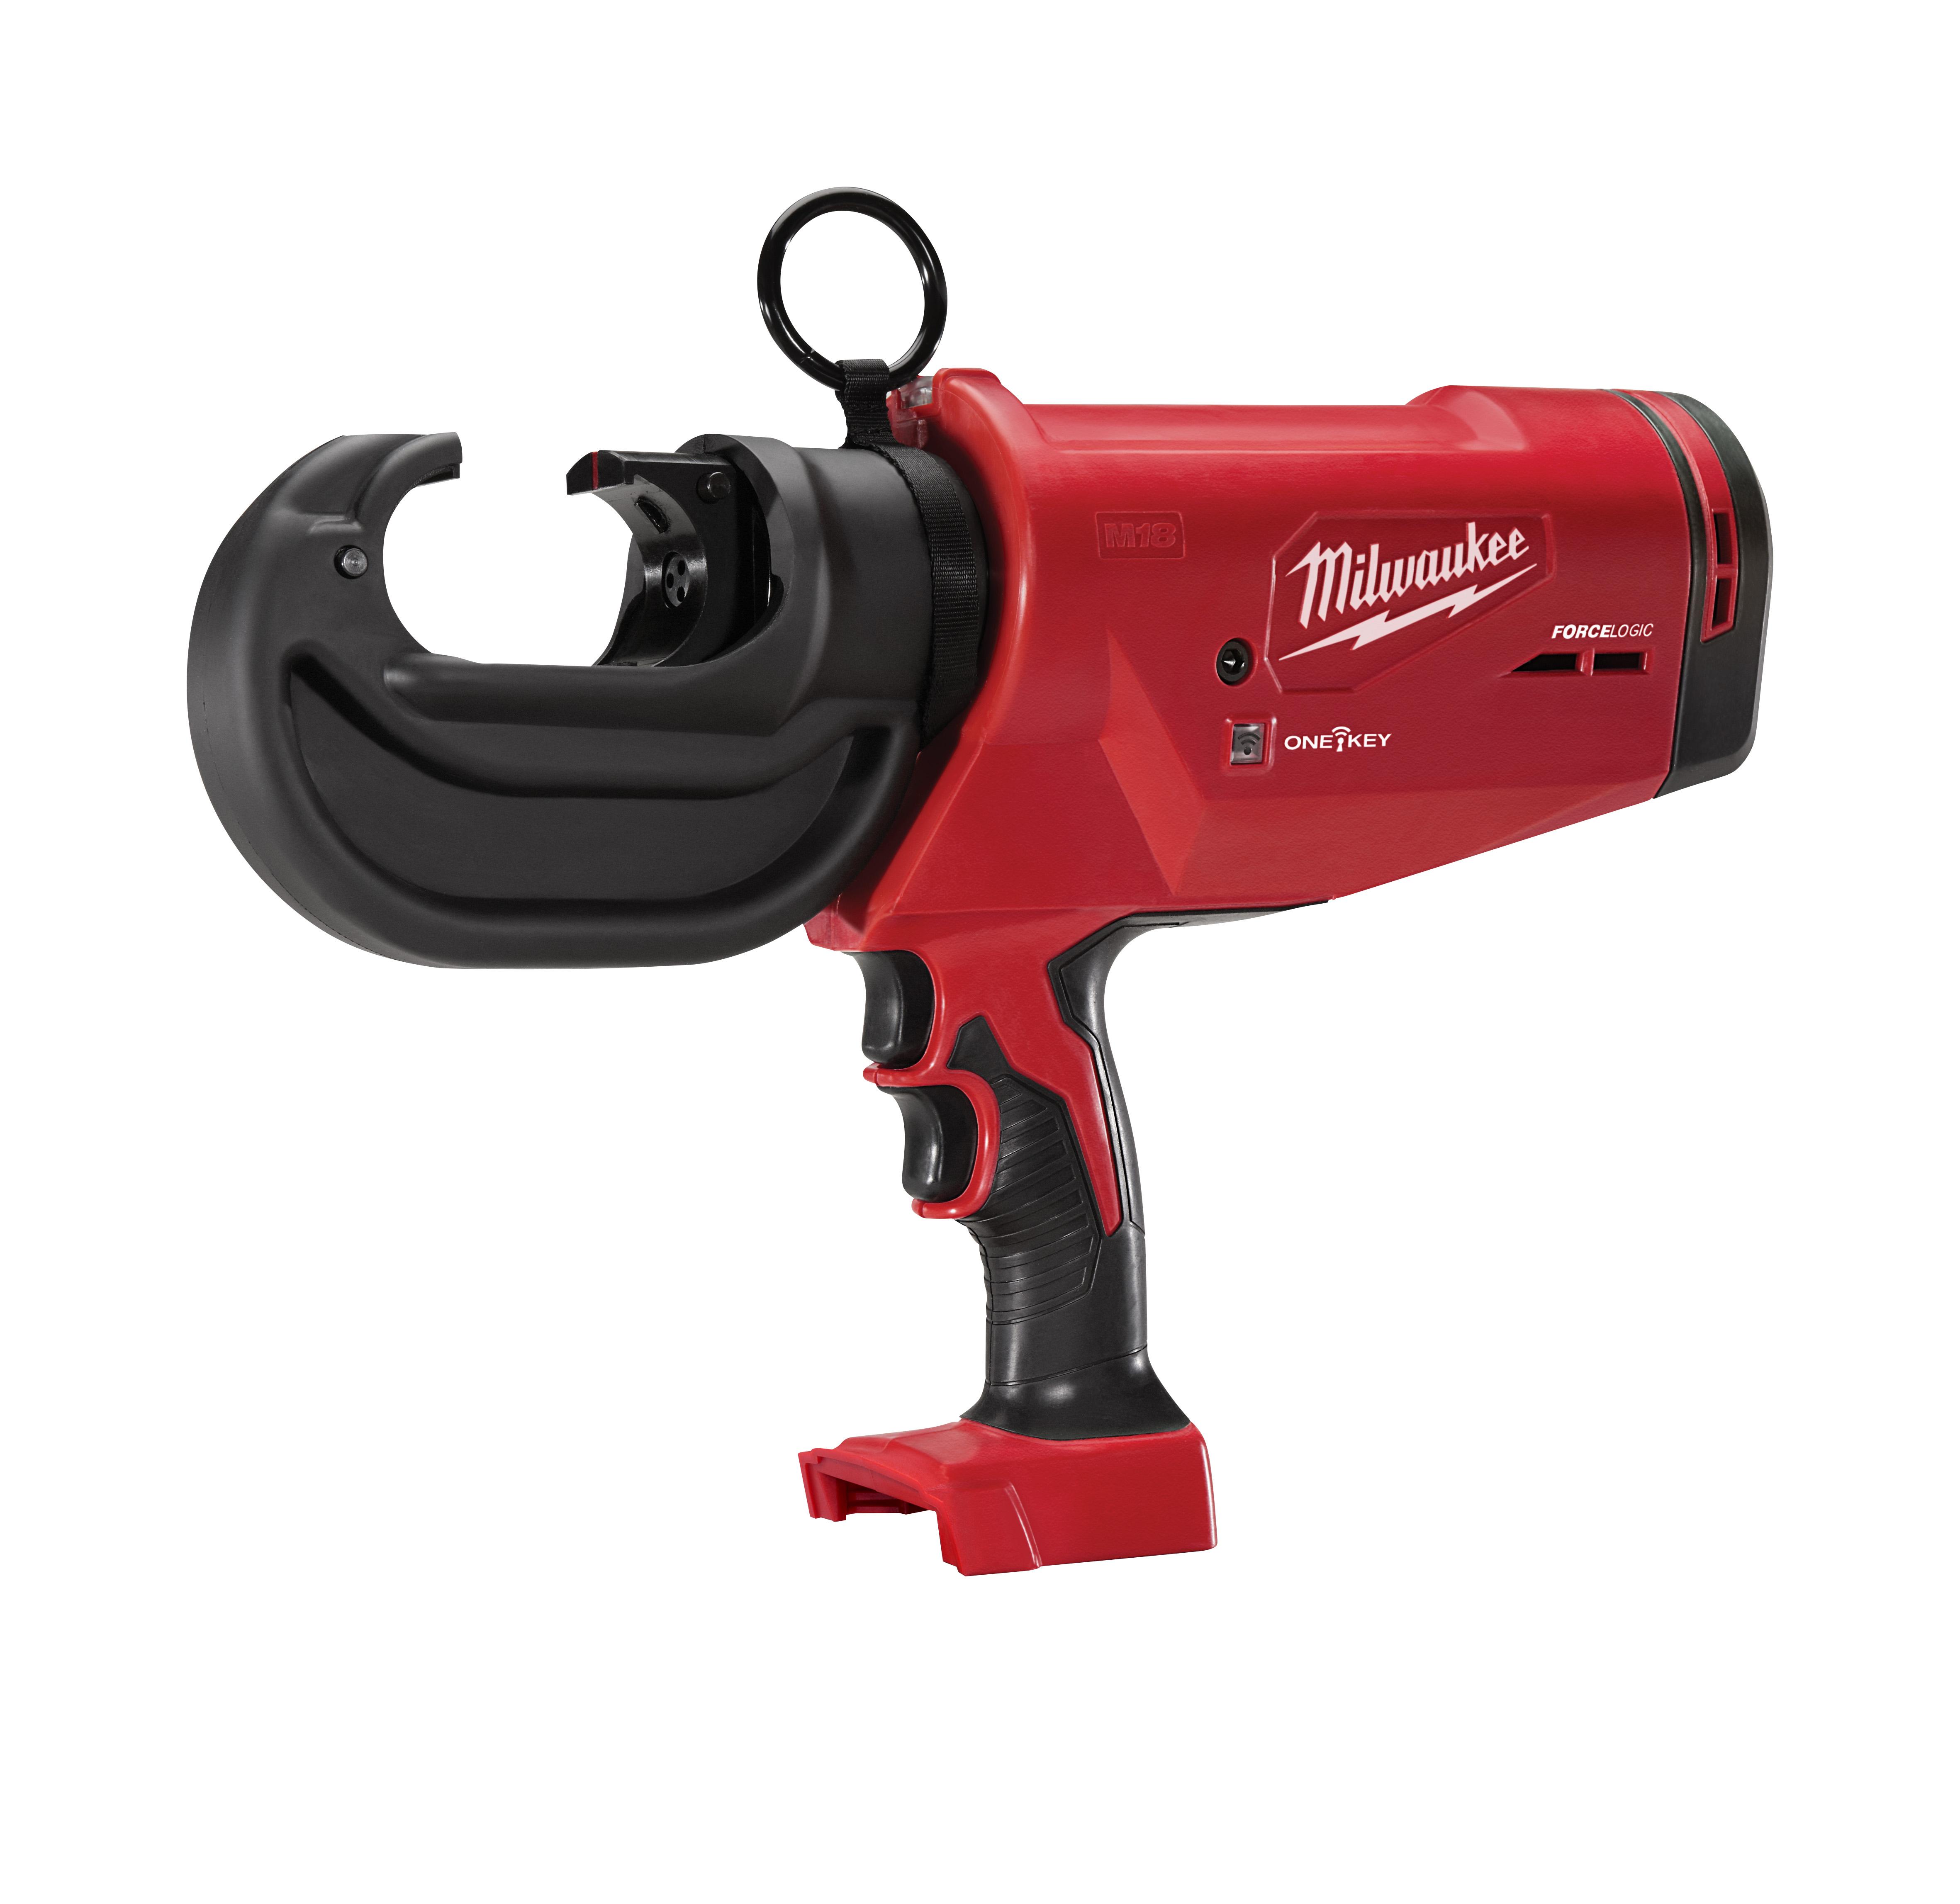 Milwaukee® M18™ FORCELOGIC™ 2778-20 12T Cordless Utility Crimper, 12 ton Crimping, 18 VDC, M18™ REDLITHIUM™ Battery, 16 in OAL